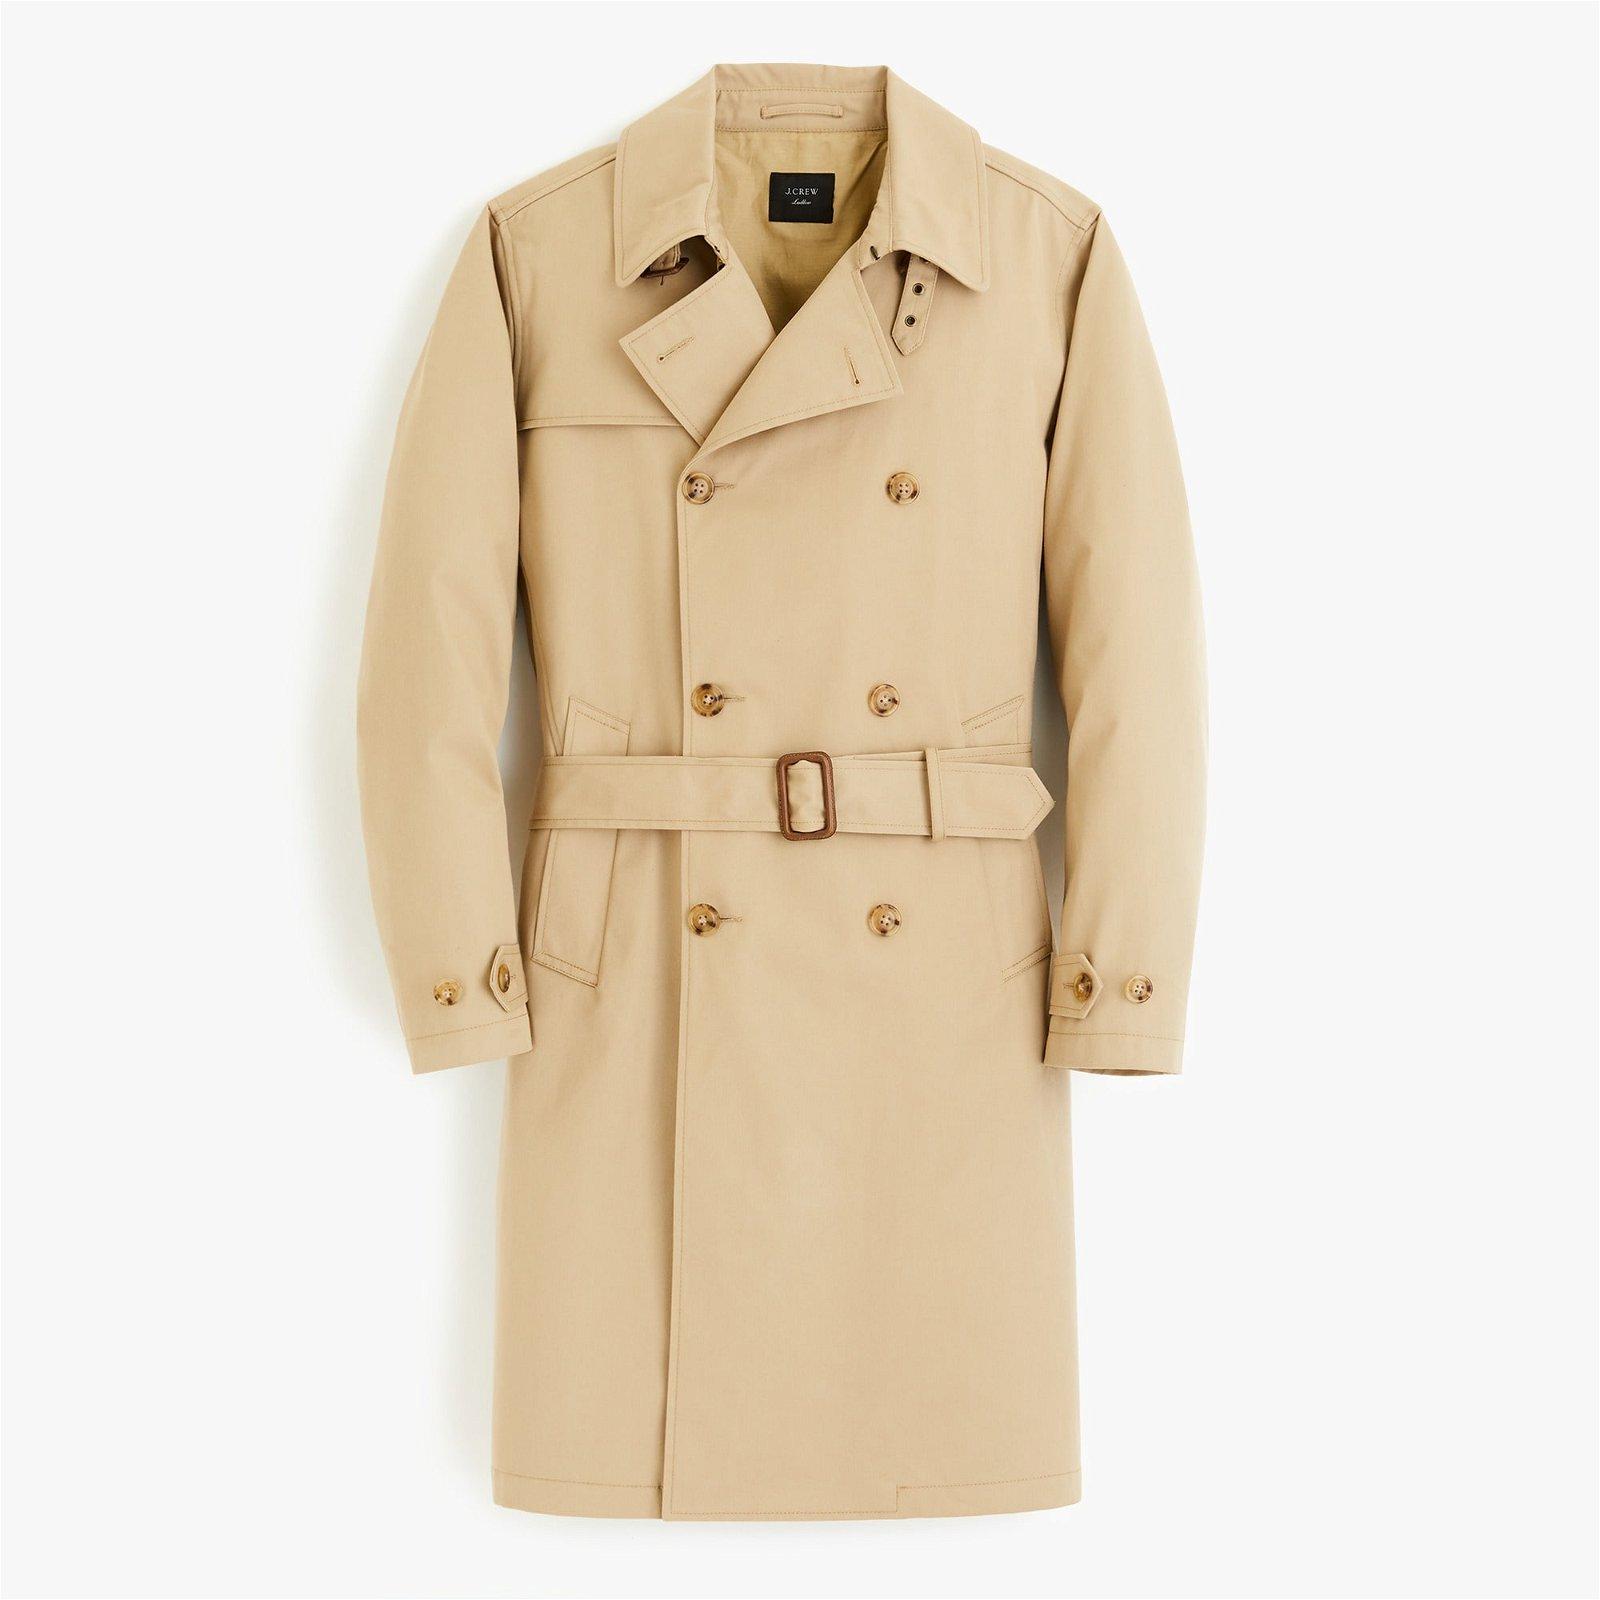 Olmetex® trench coat